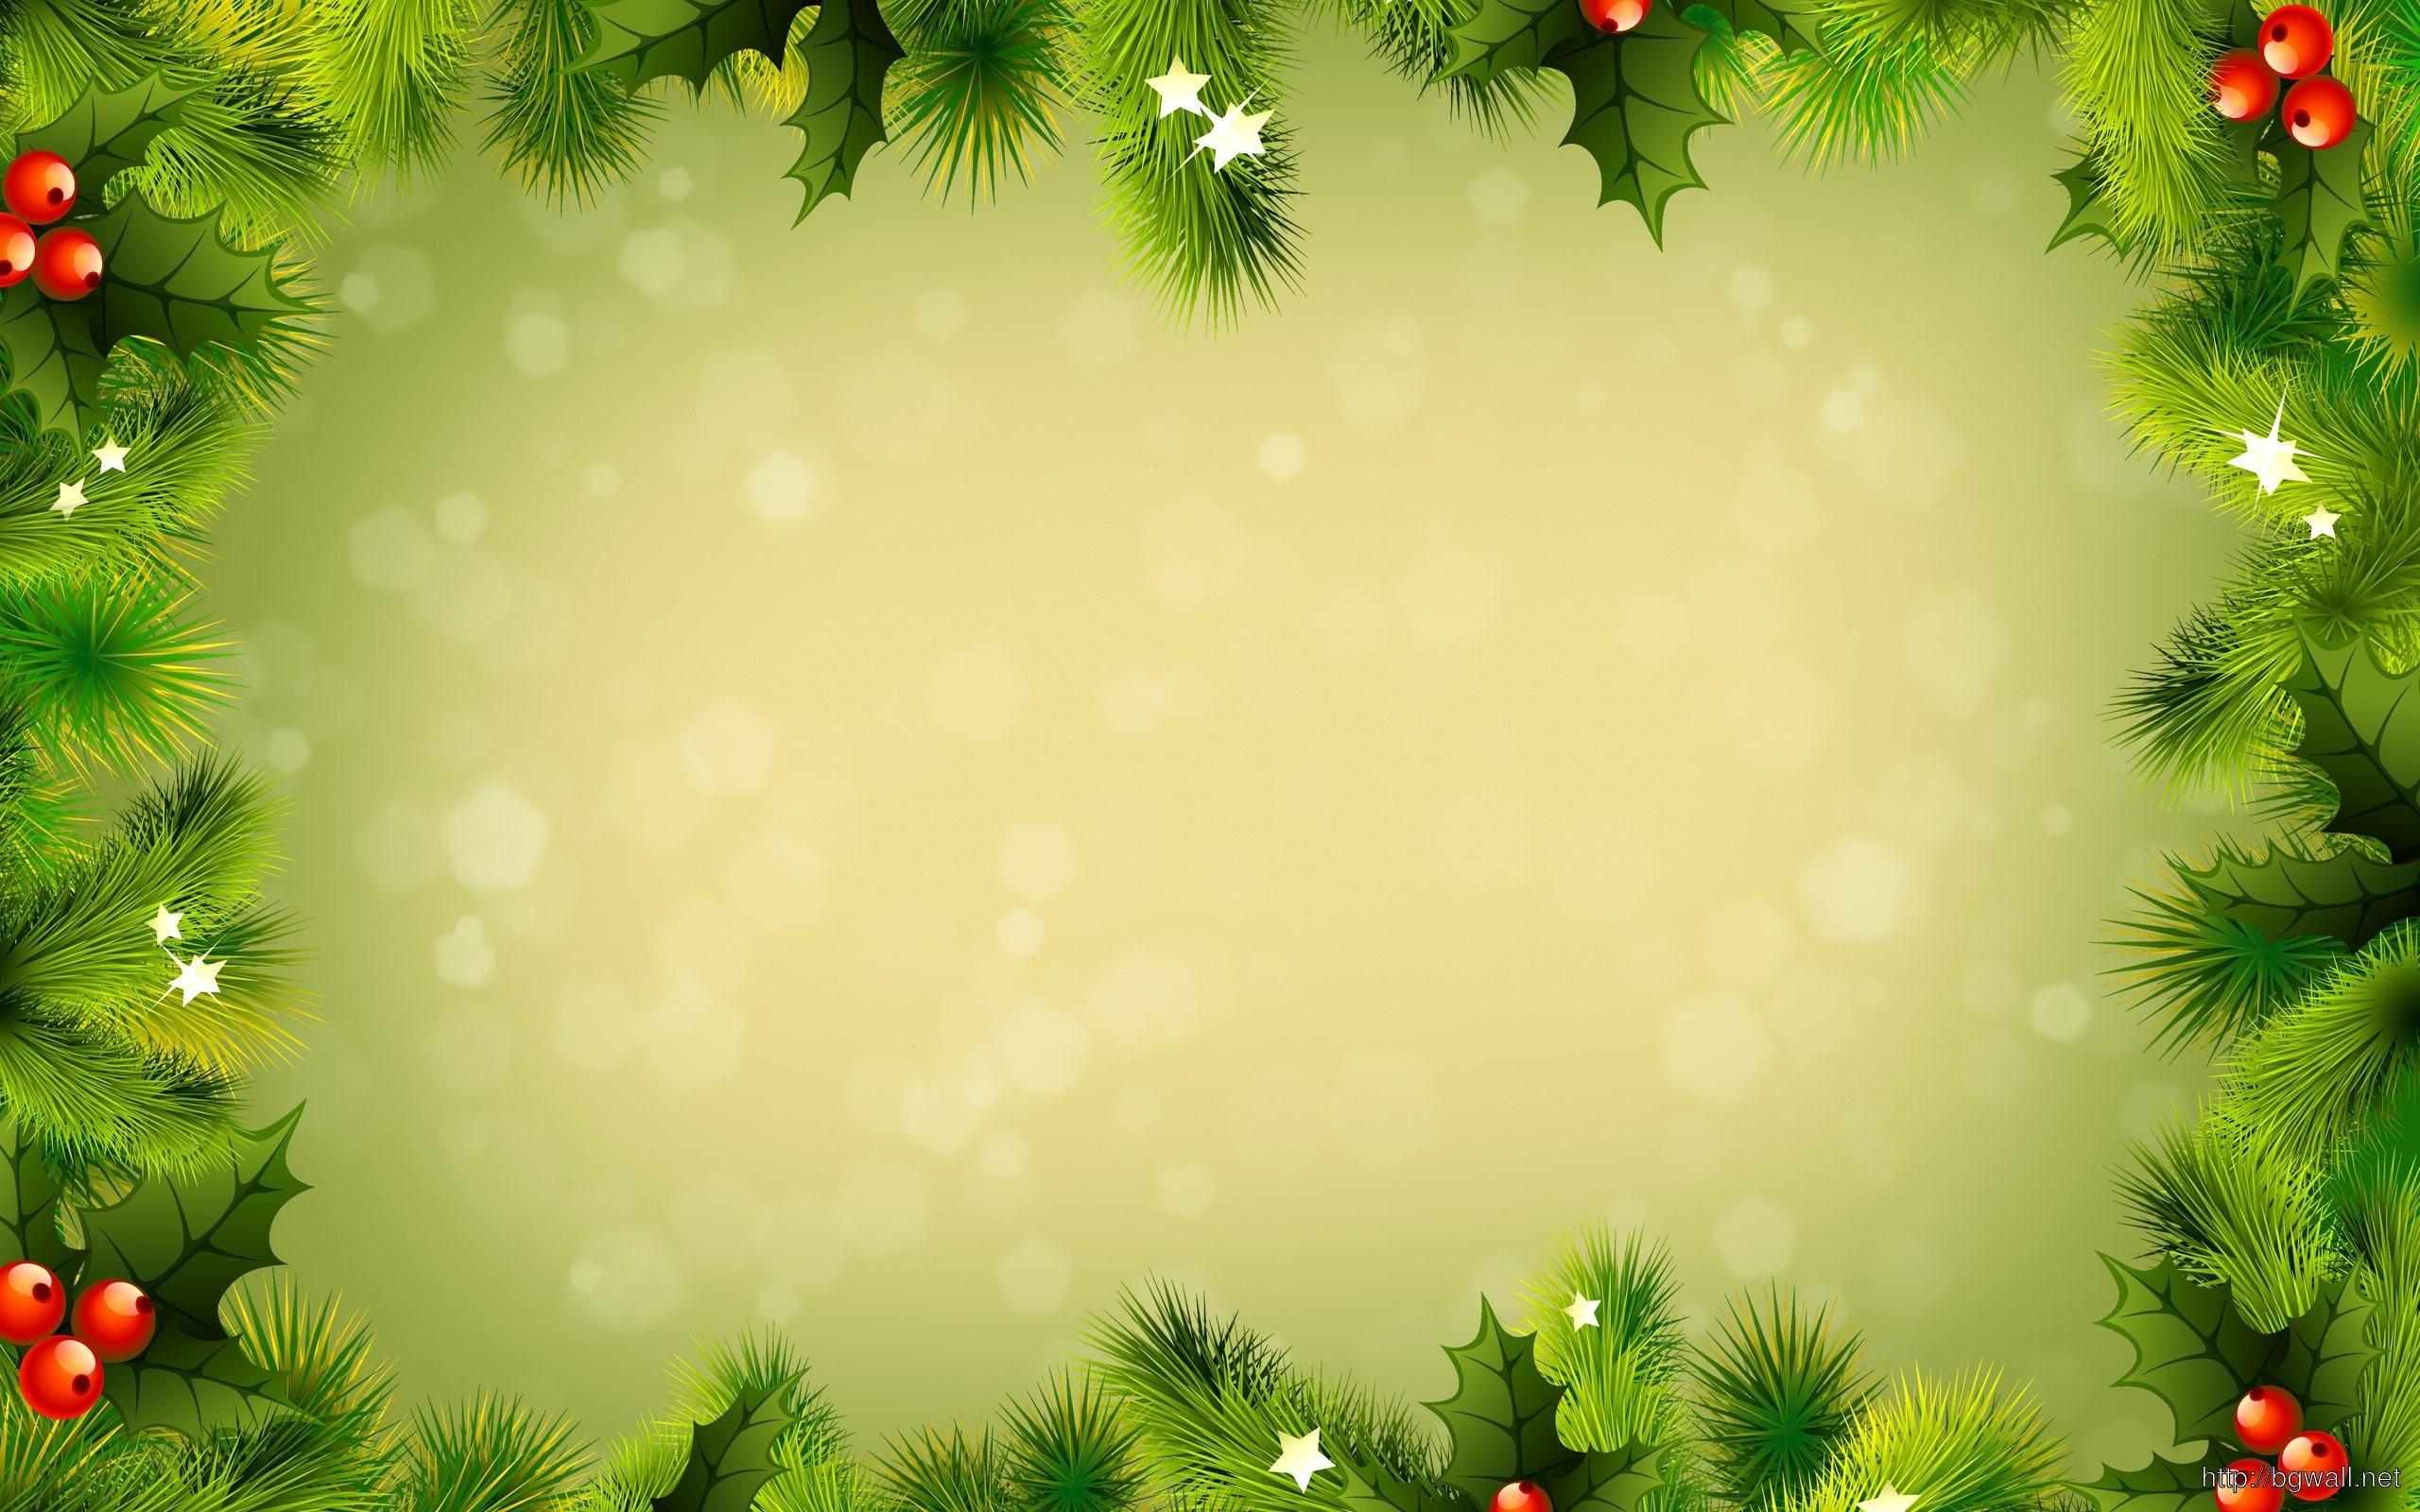 Christmas Background Wallpaper – Background Wallpaper HD